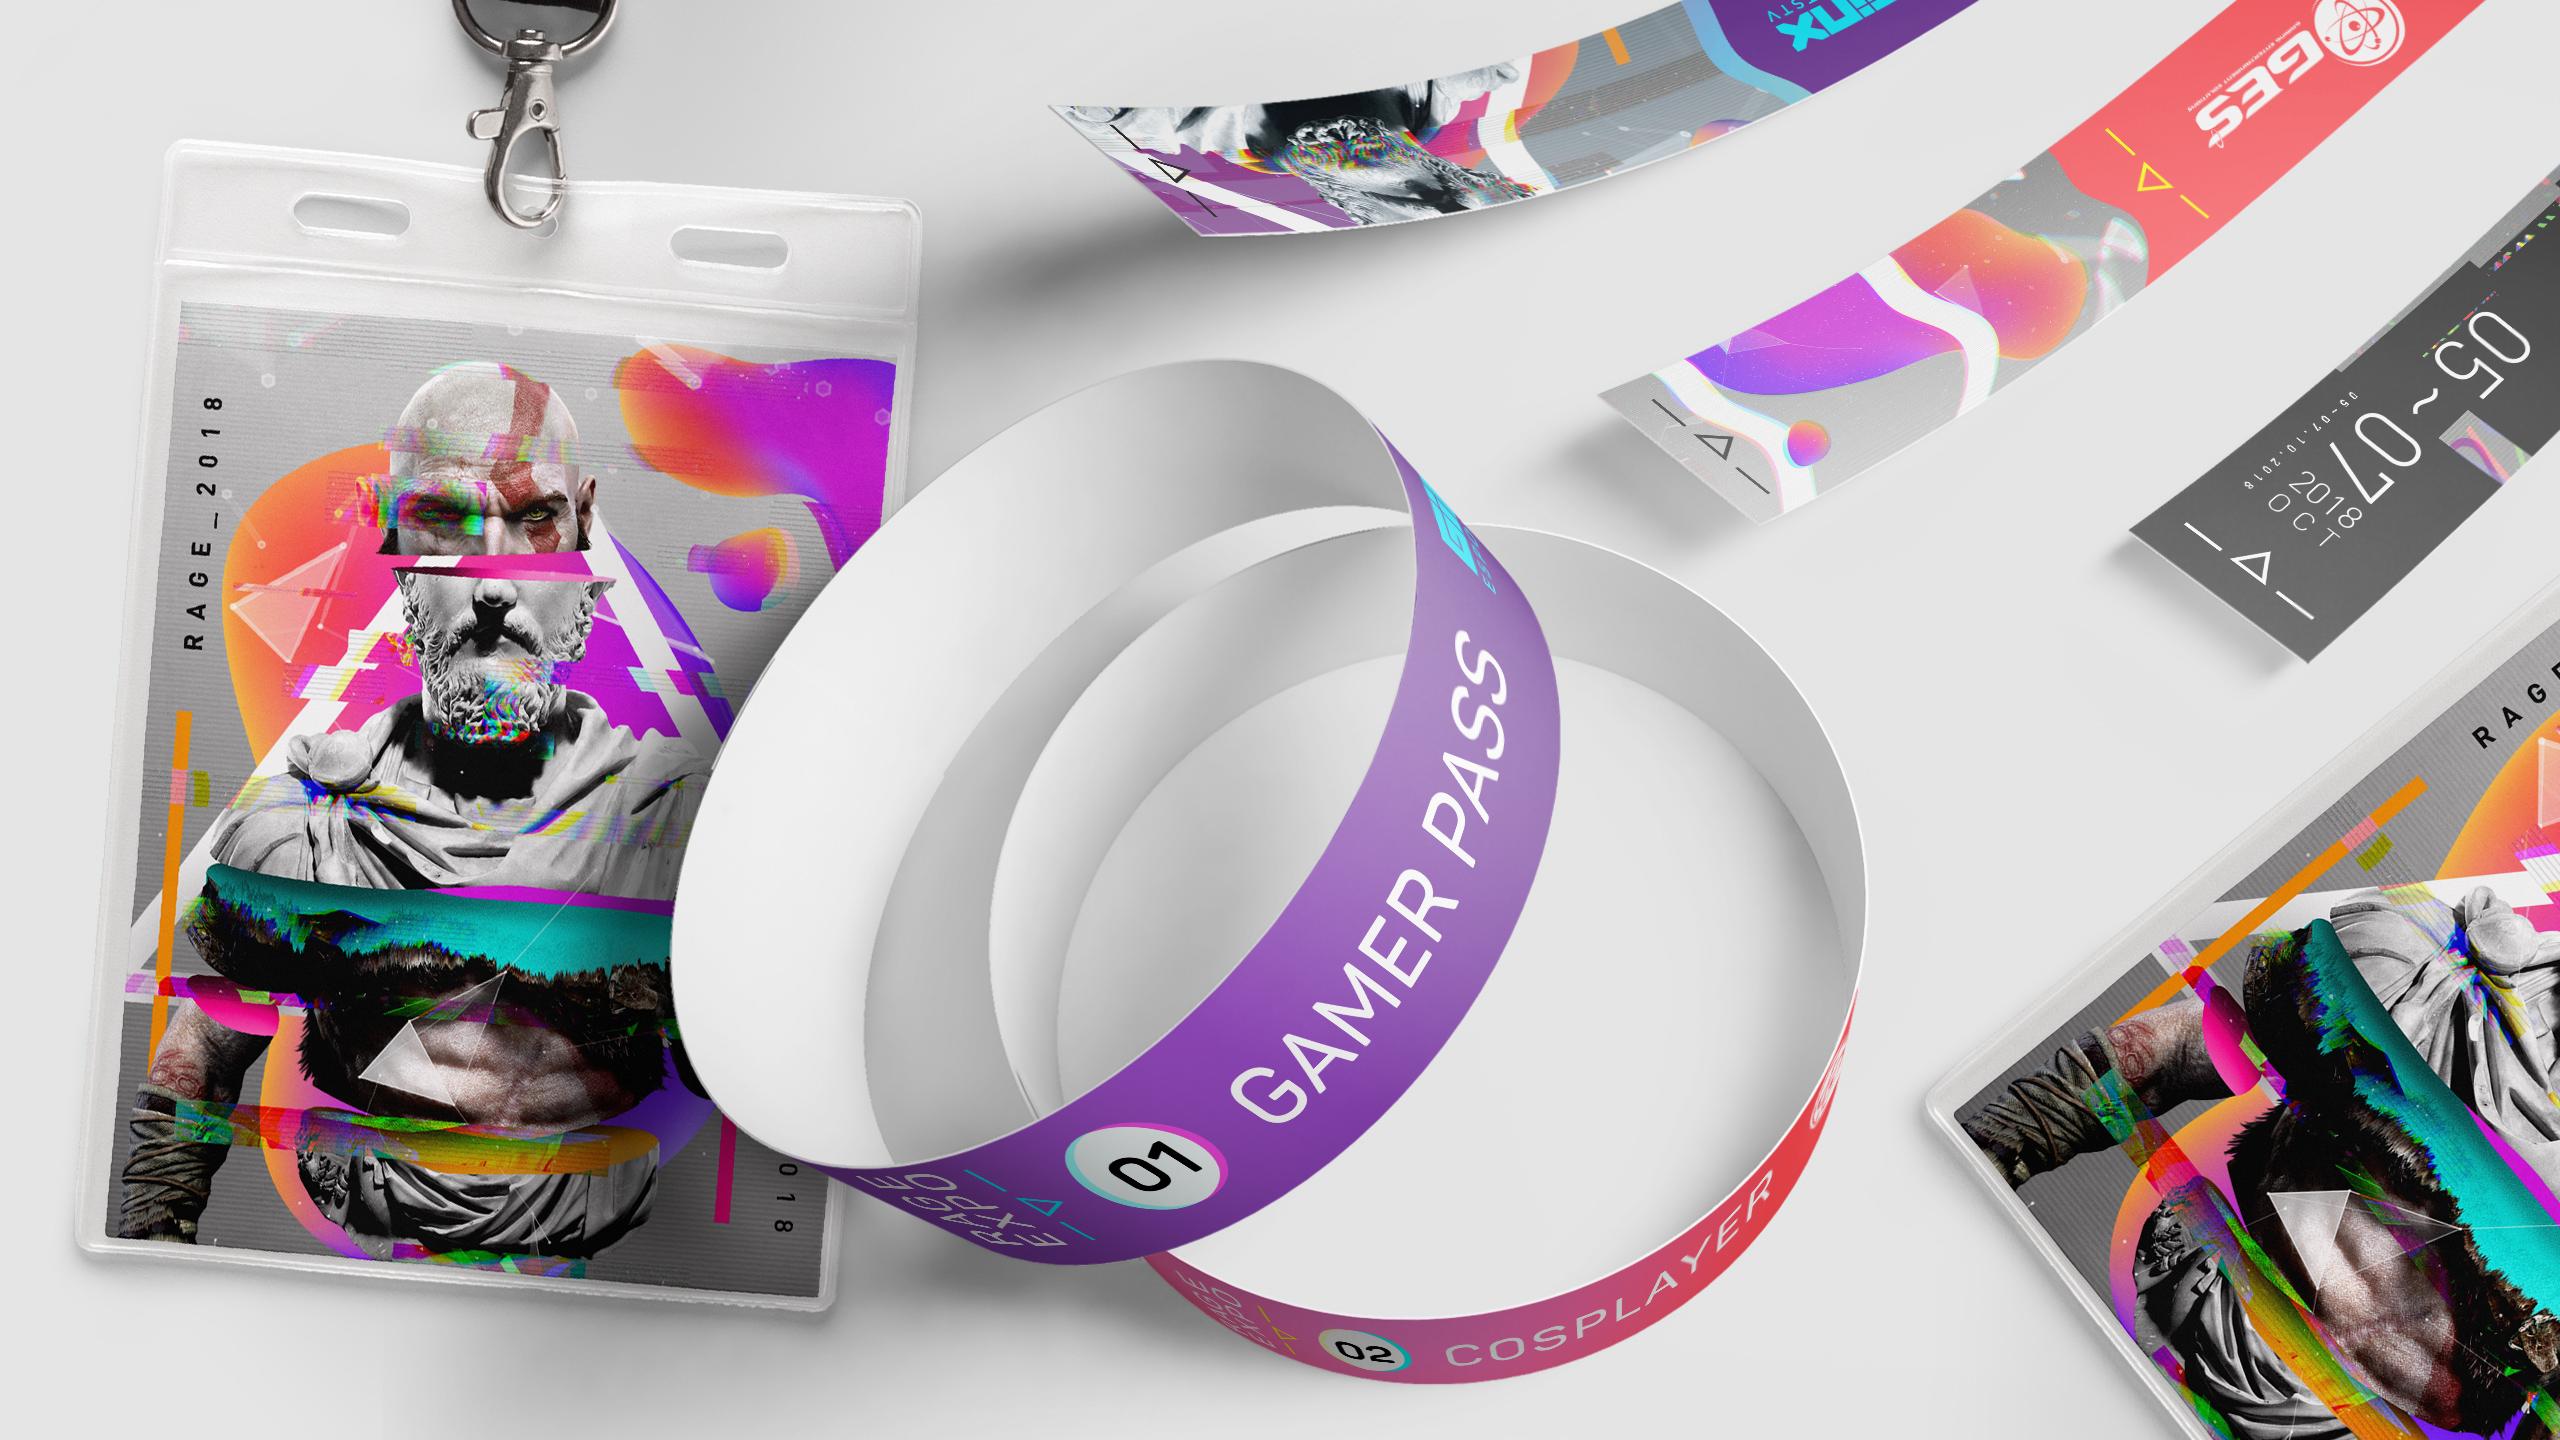 rAge Expo wristband access designs